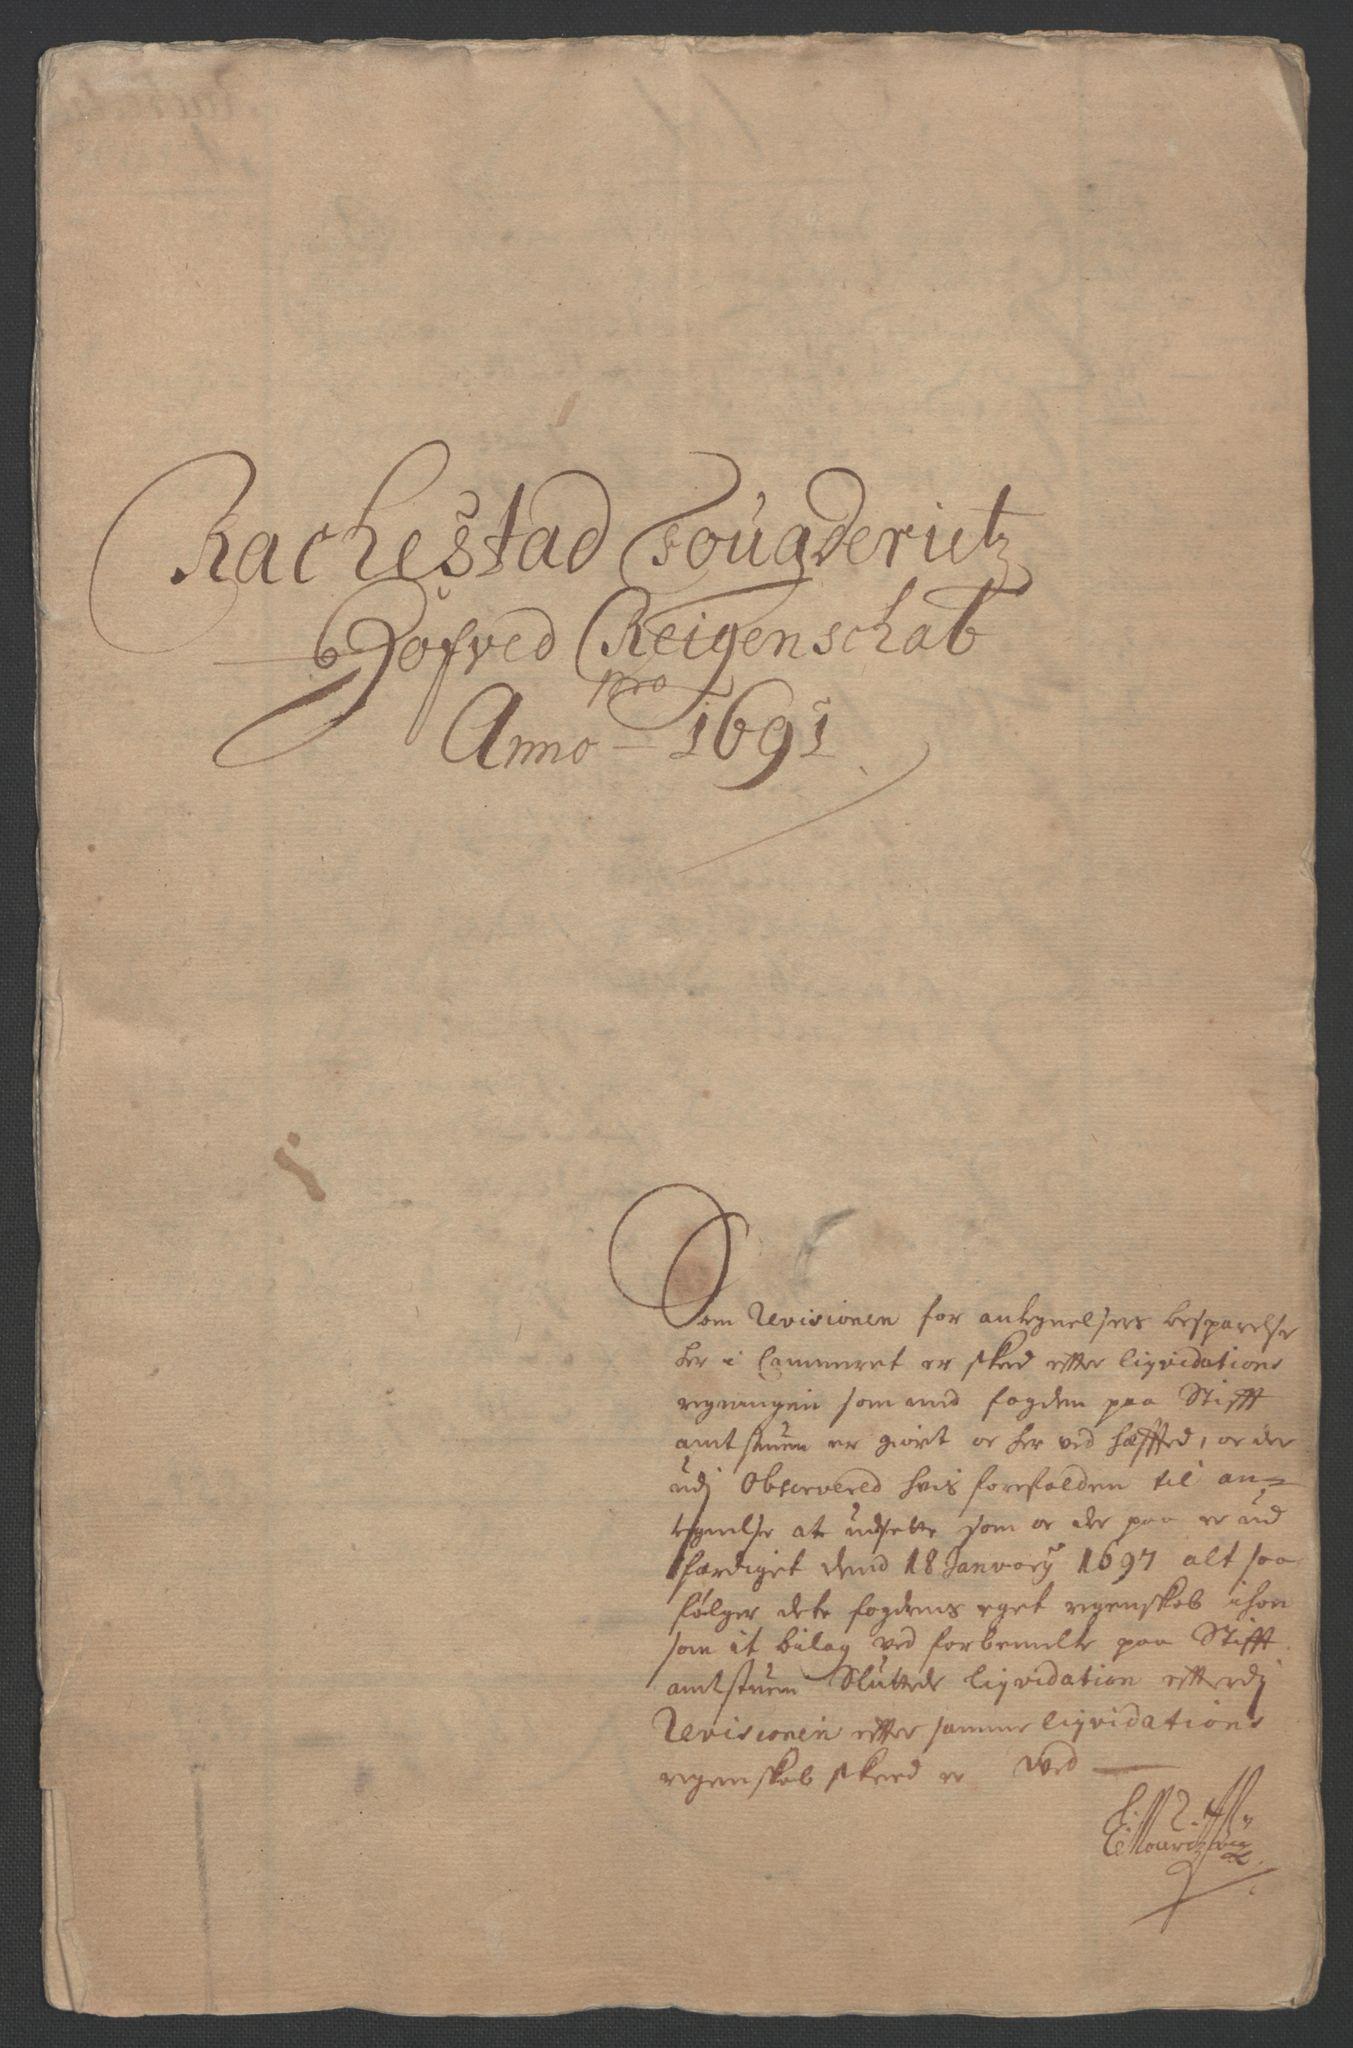 RA, Rentekammeret inntil 1814, Reviderte regnskaper, Fogderegnskap, R05/L0278: Fogderegnskap Rakkestad, 1691-1693, s. 3